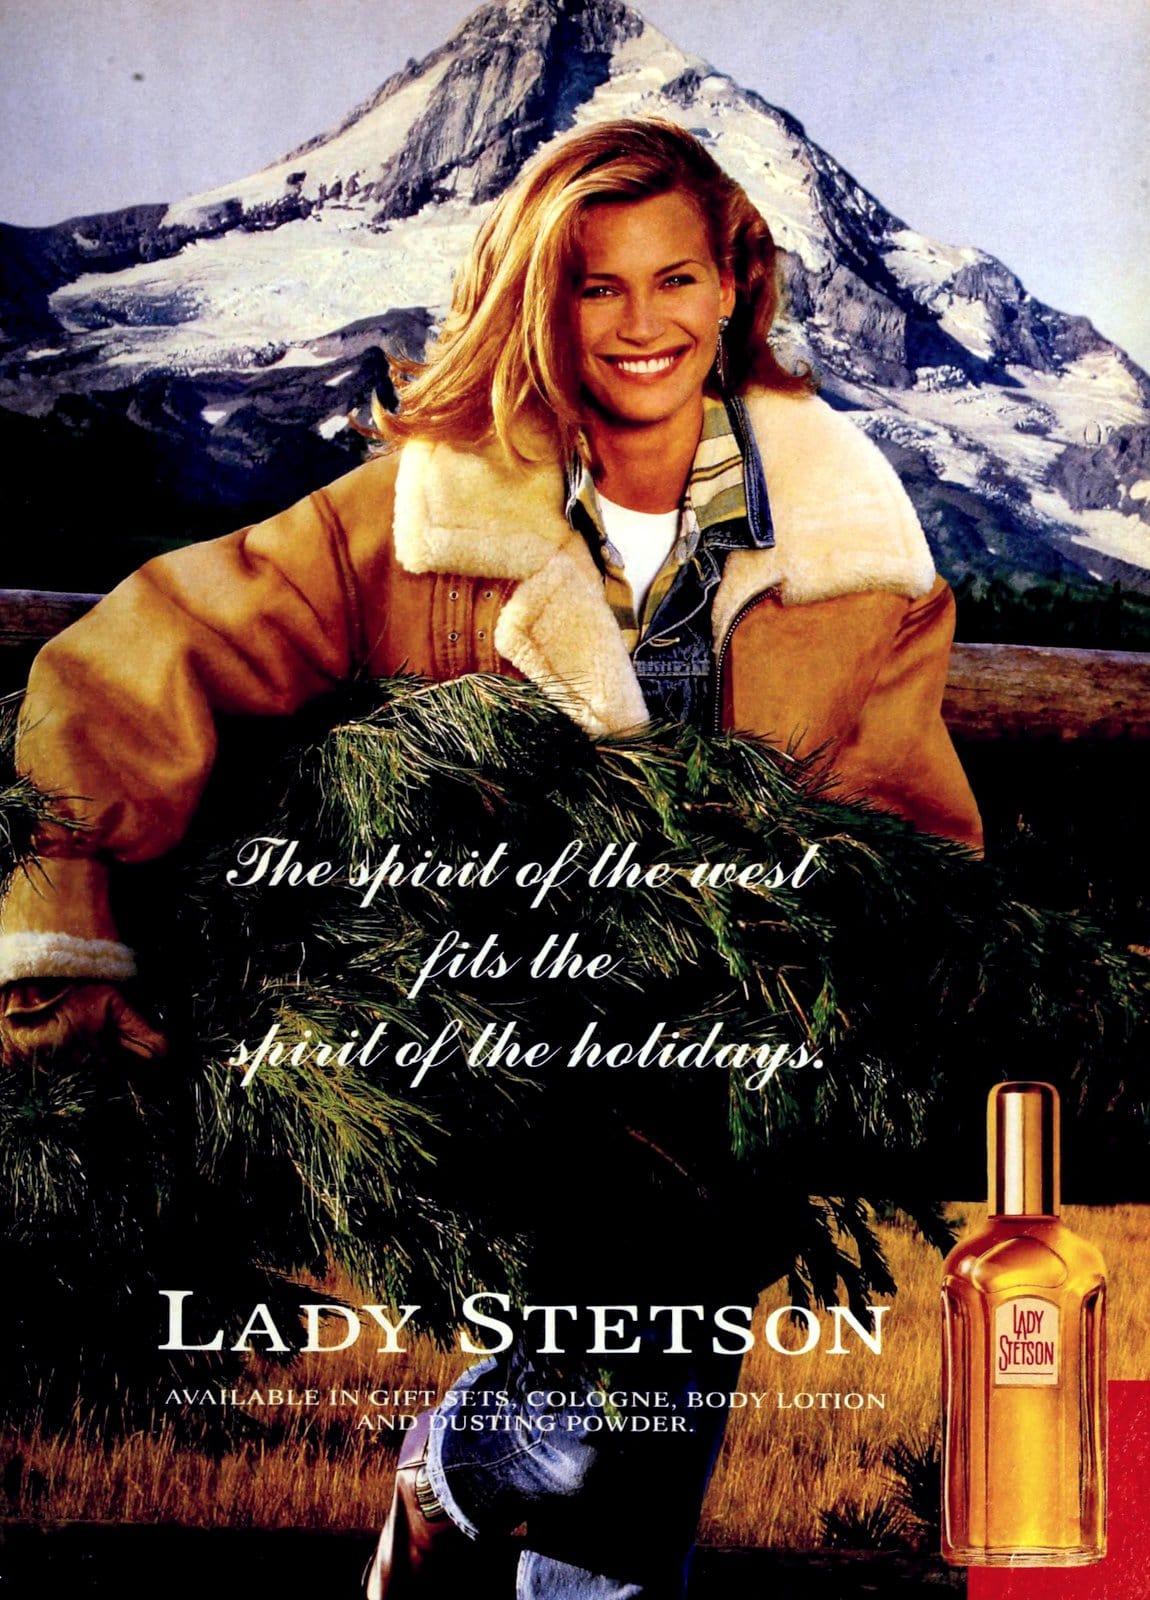 Lady Stetson perfume - Vintage ad with actress Natasha Henstridge (1993) at ClickAmericana.com